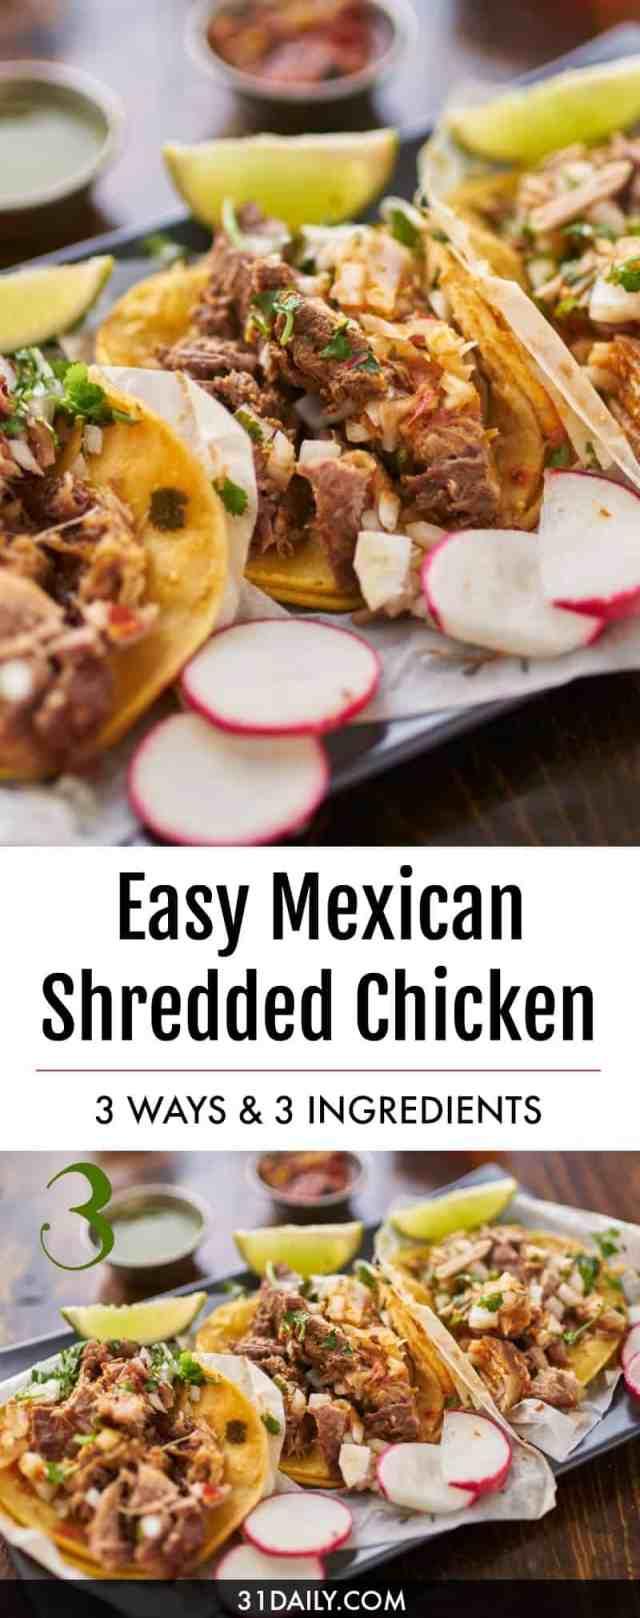 Easy Mexican Shredded Chicken - 3 Ways | 31Daily.com